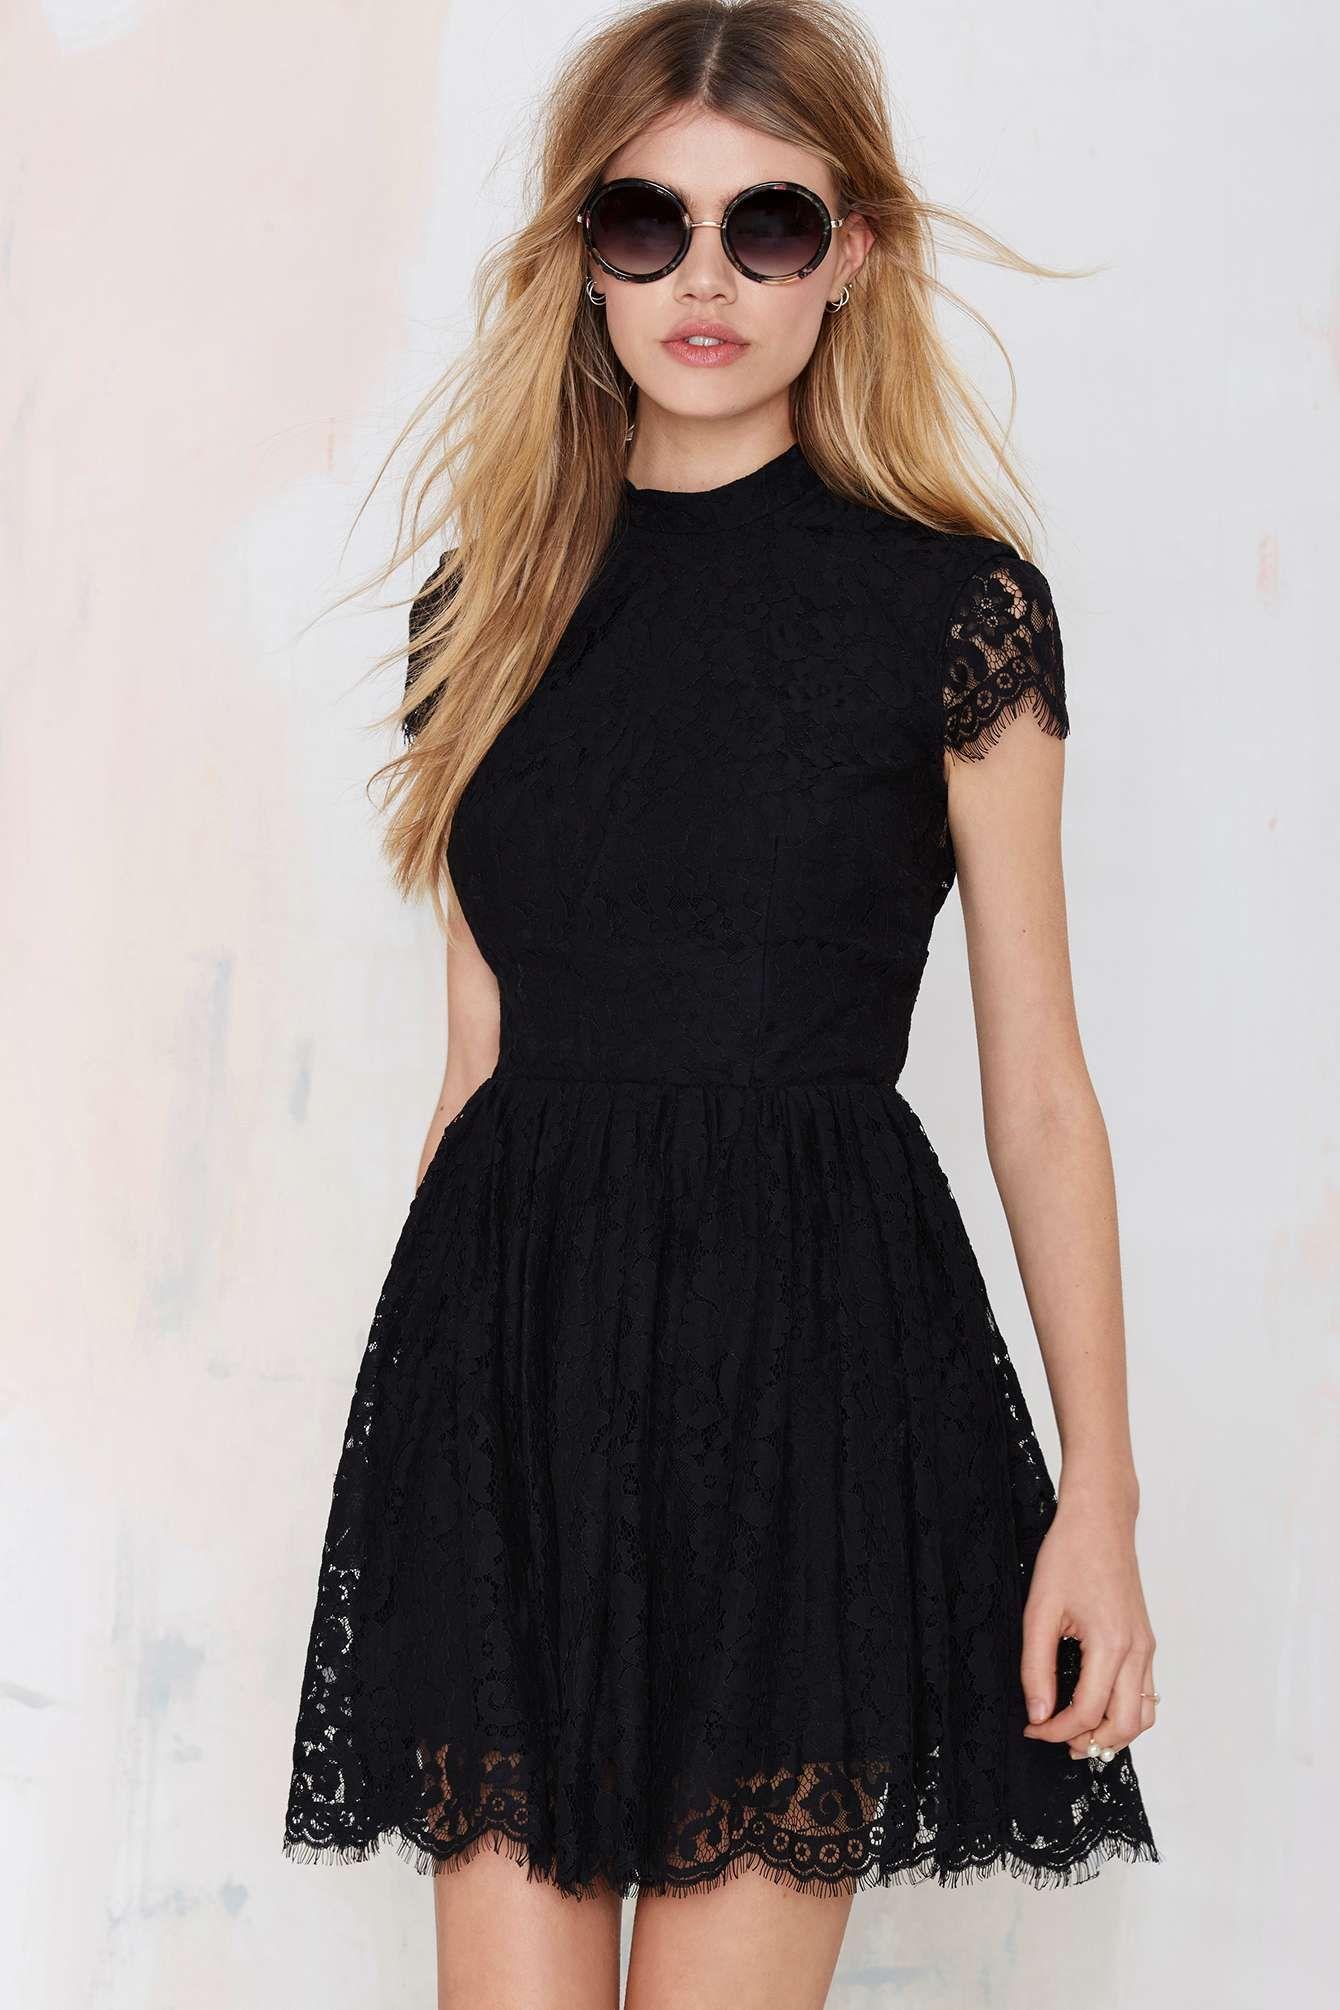 Lace dress styles for funeral  Keepsake Eclipse Lace Dress  Black  LBD  Dresses  Pinterest